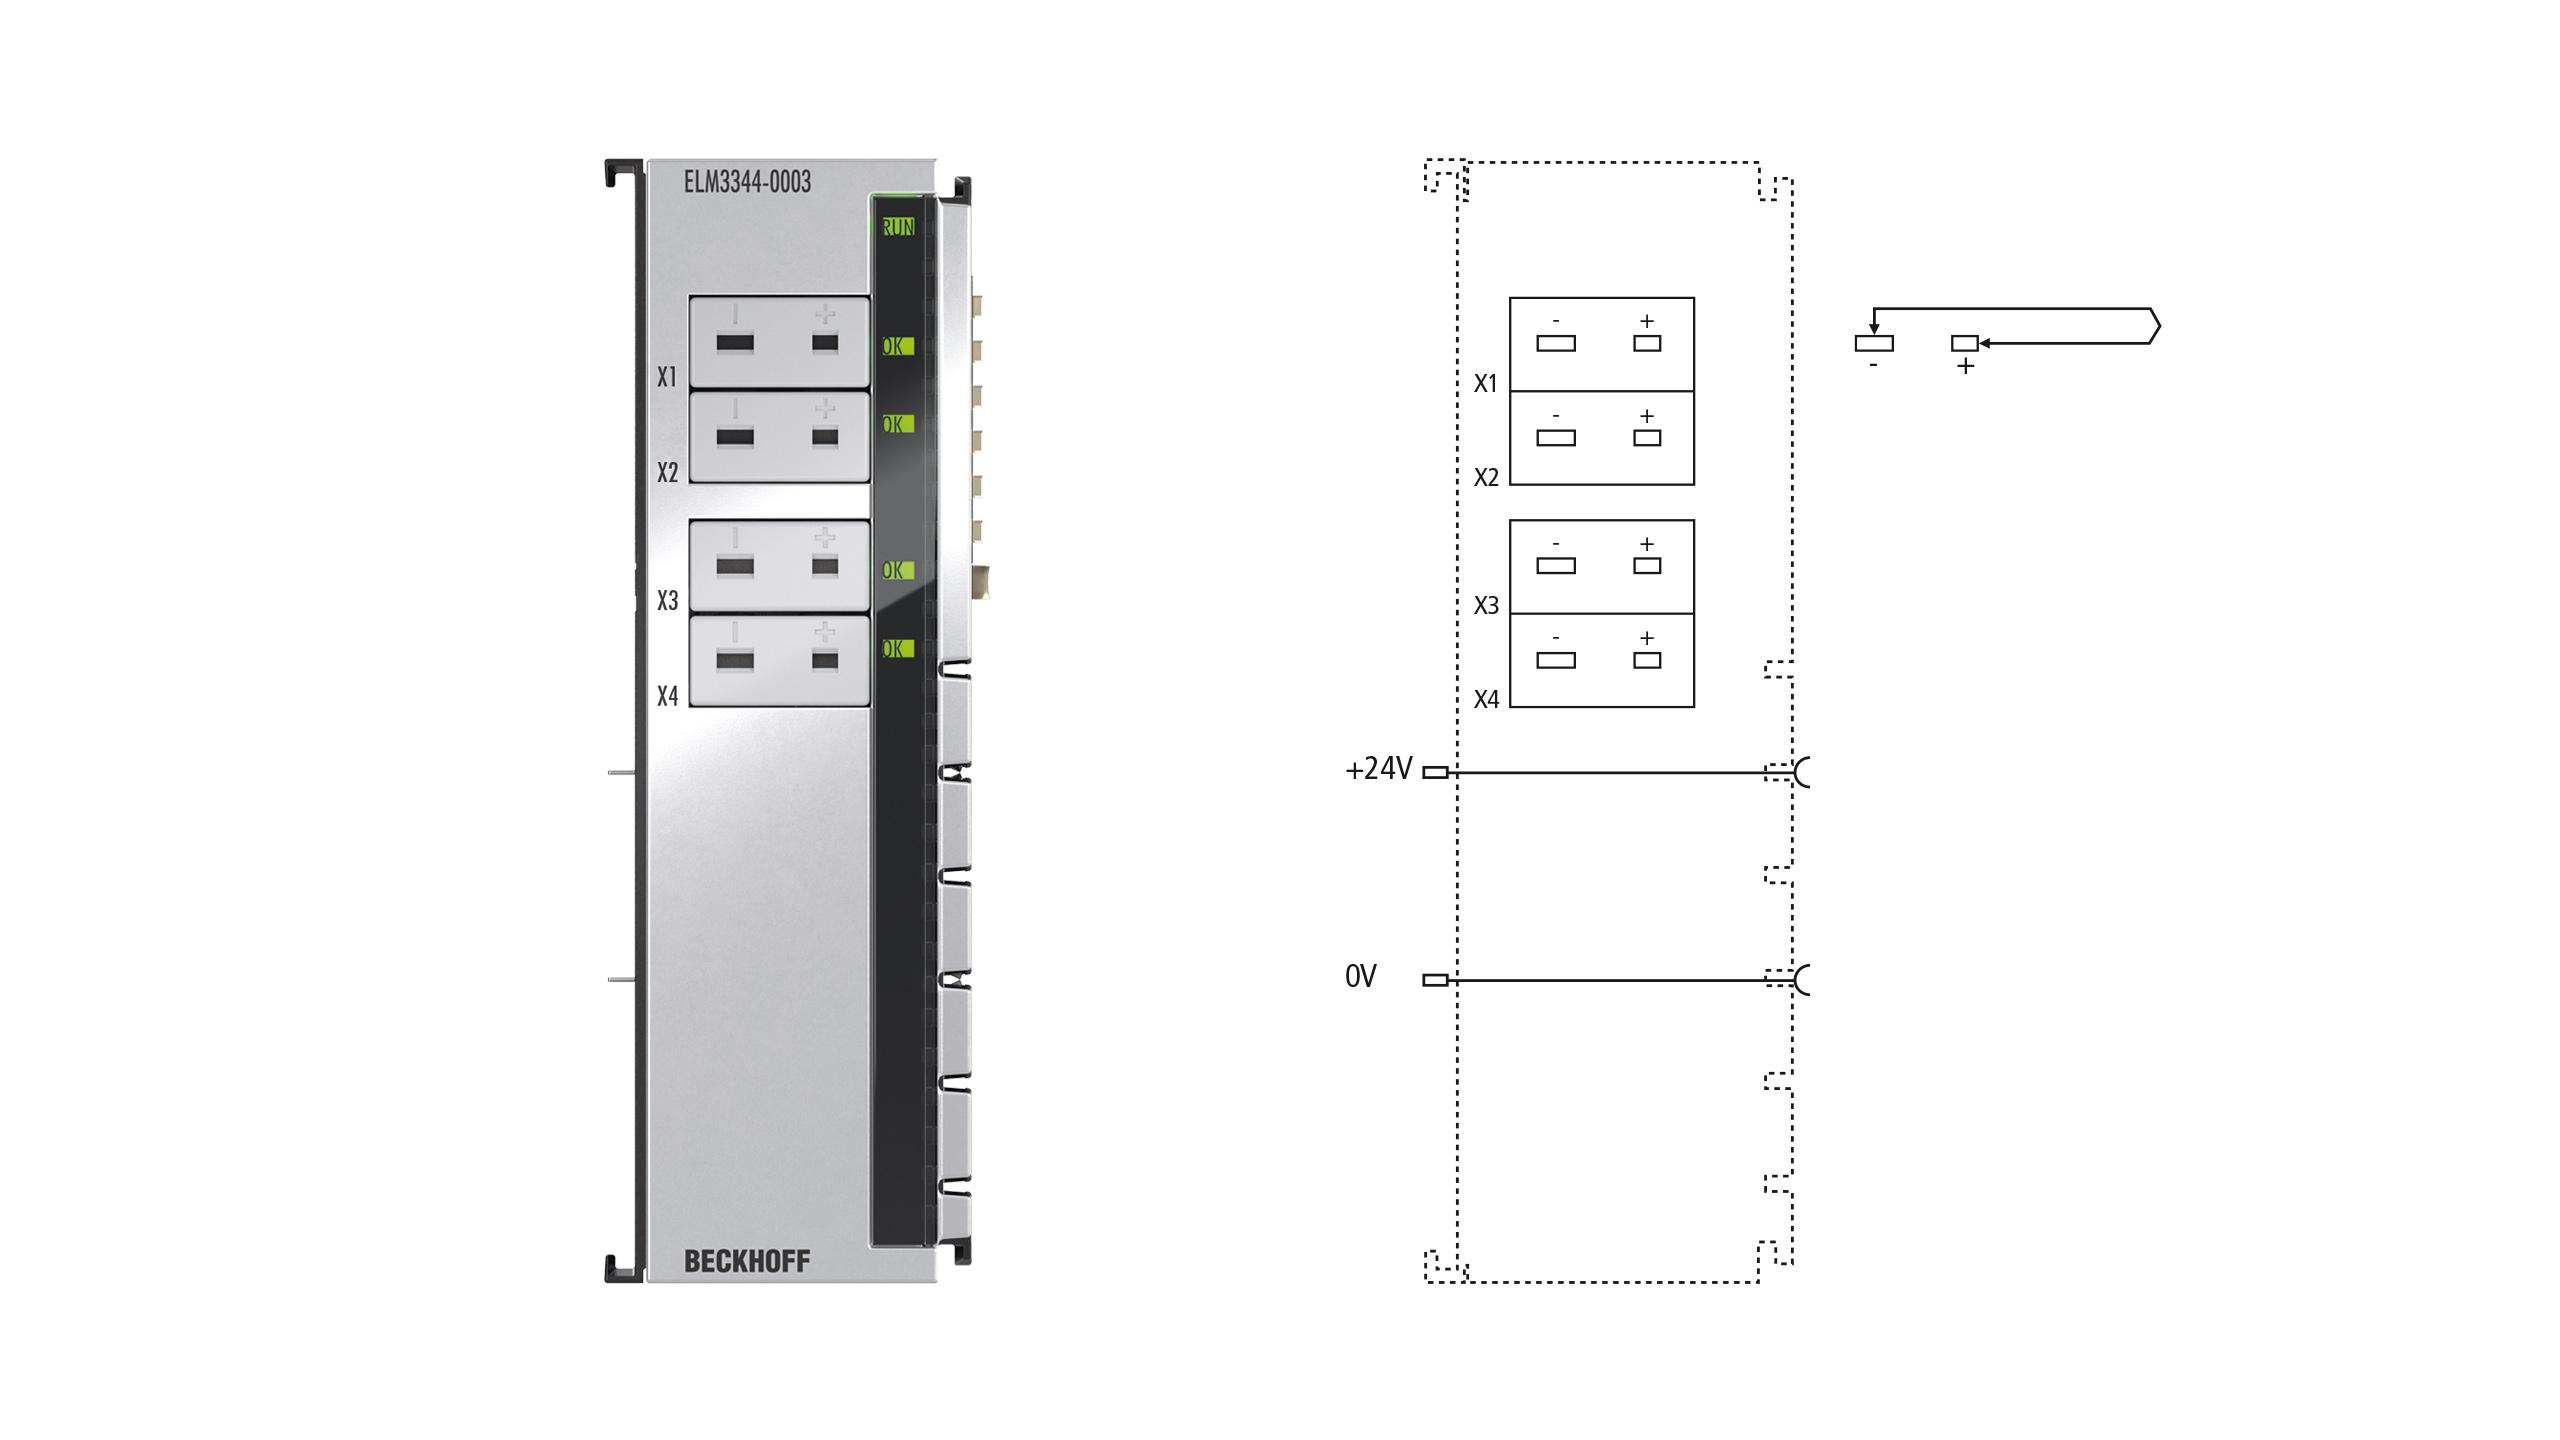 ELM3344-0003 | EtherCAT Terminal, 4-channel analog input, temperature, thermocouple, 24bit, Mini-TC universal, high-precision, 1kSps